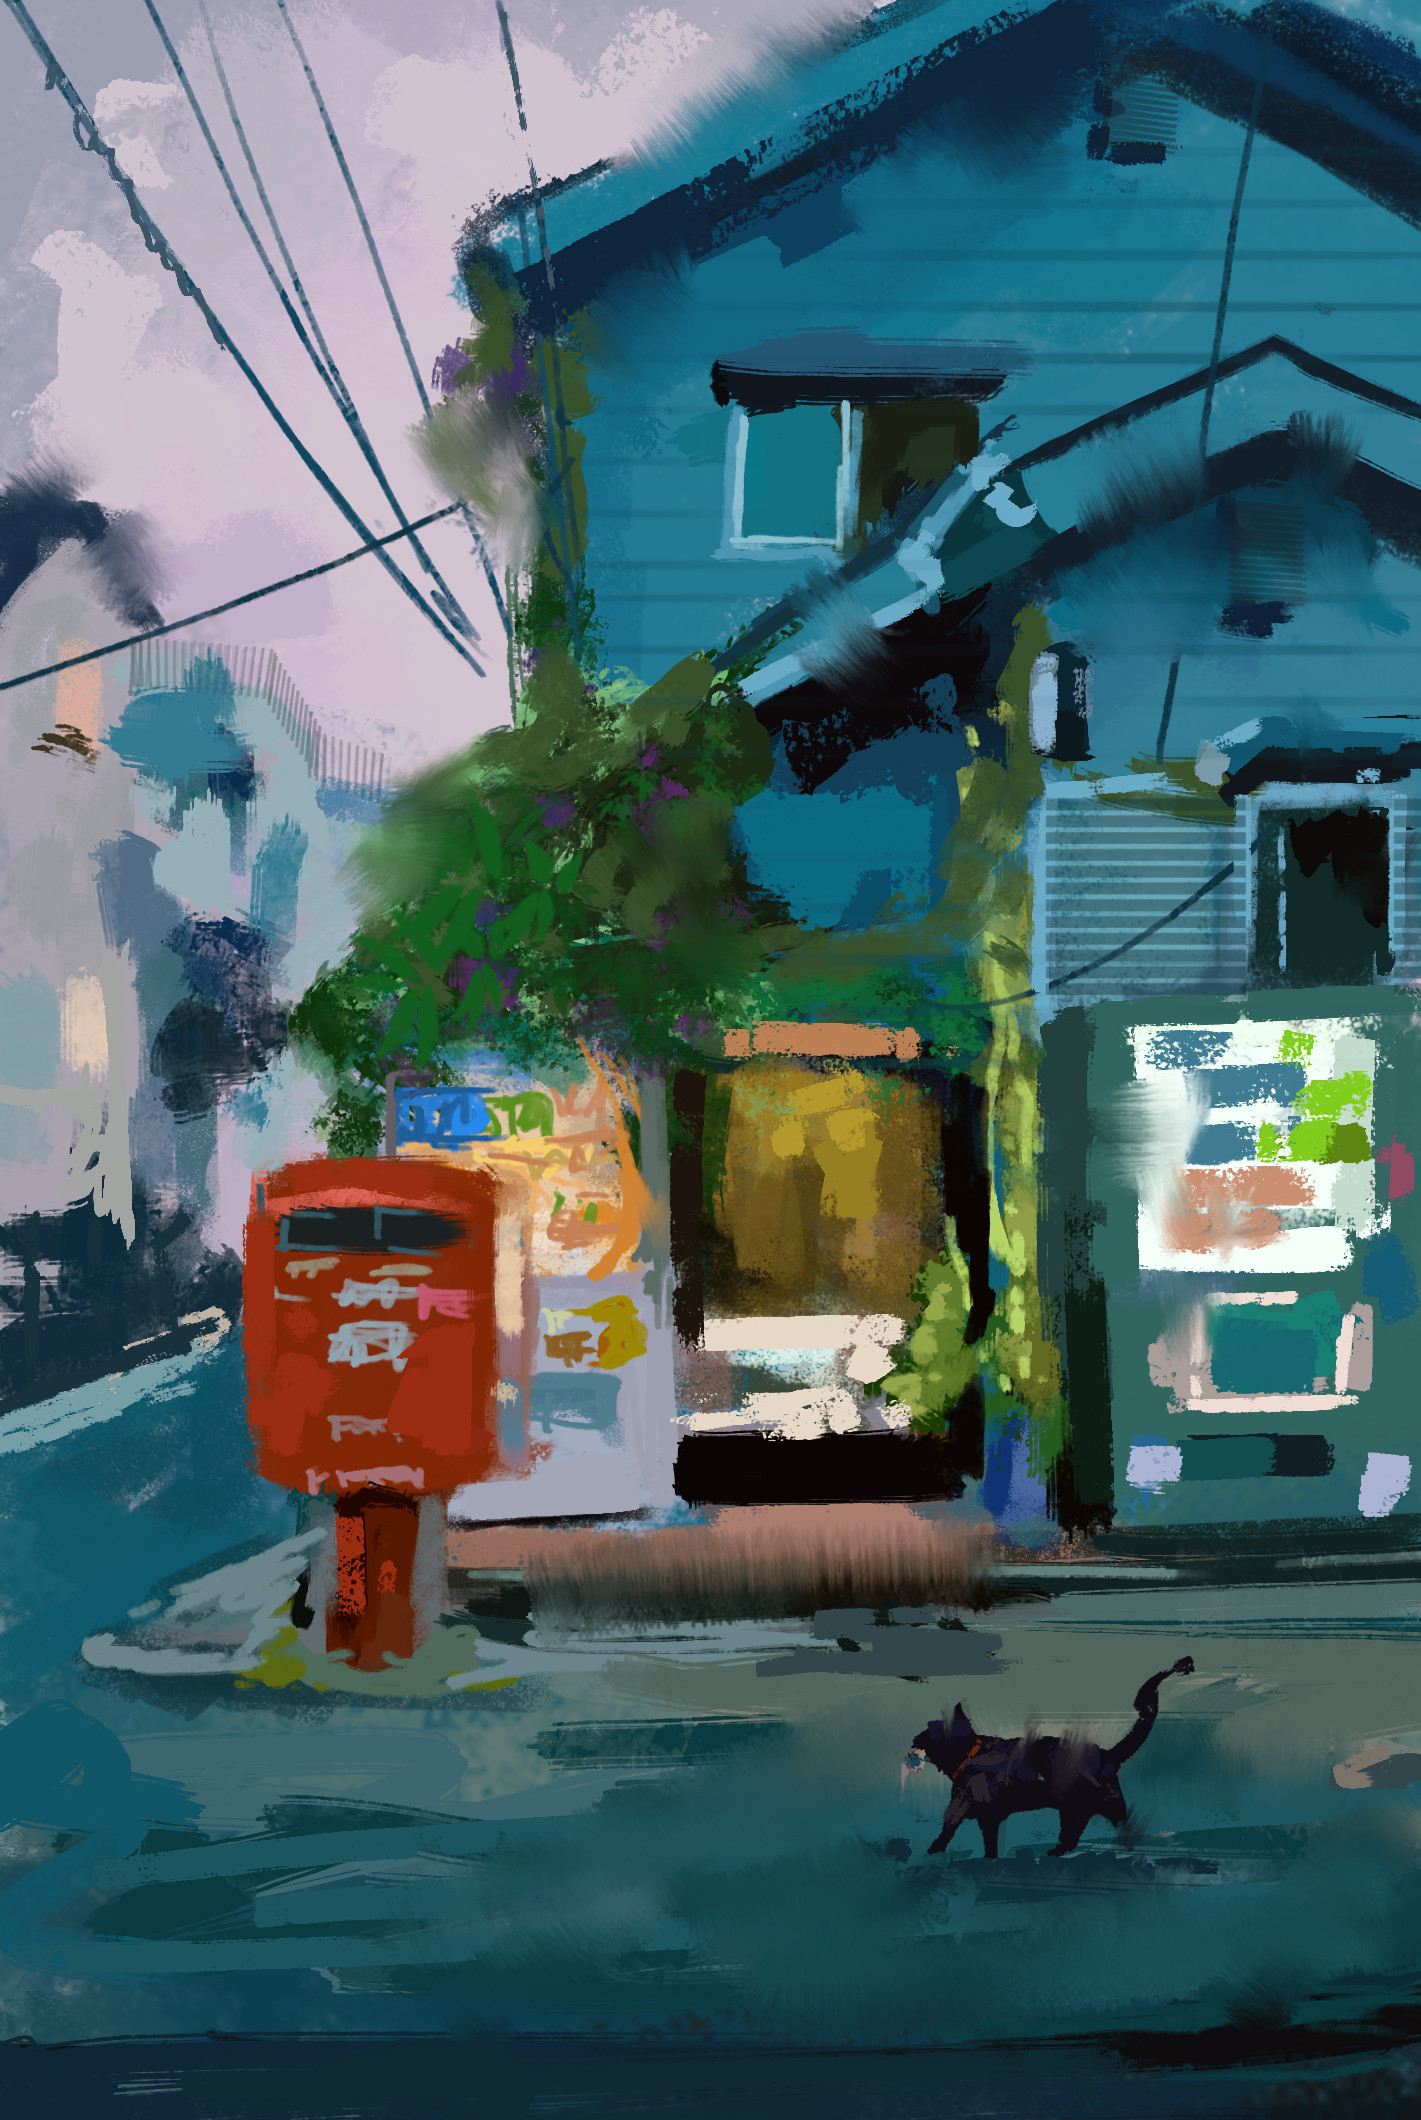 Jack dowell dusk study painting